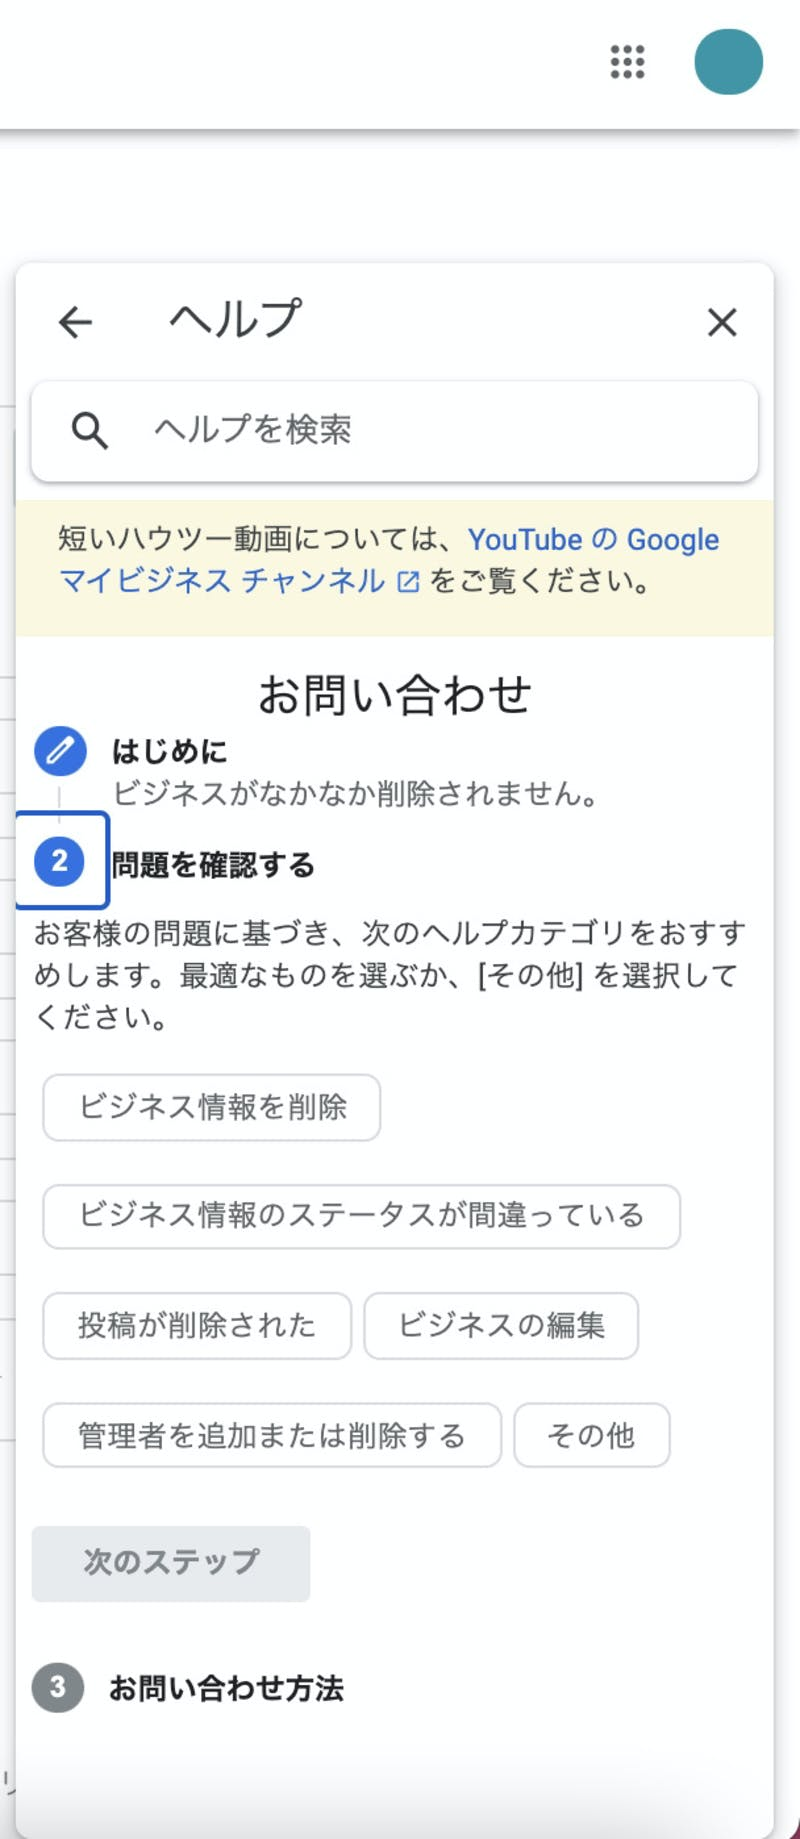 Google 問い合わせ